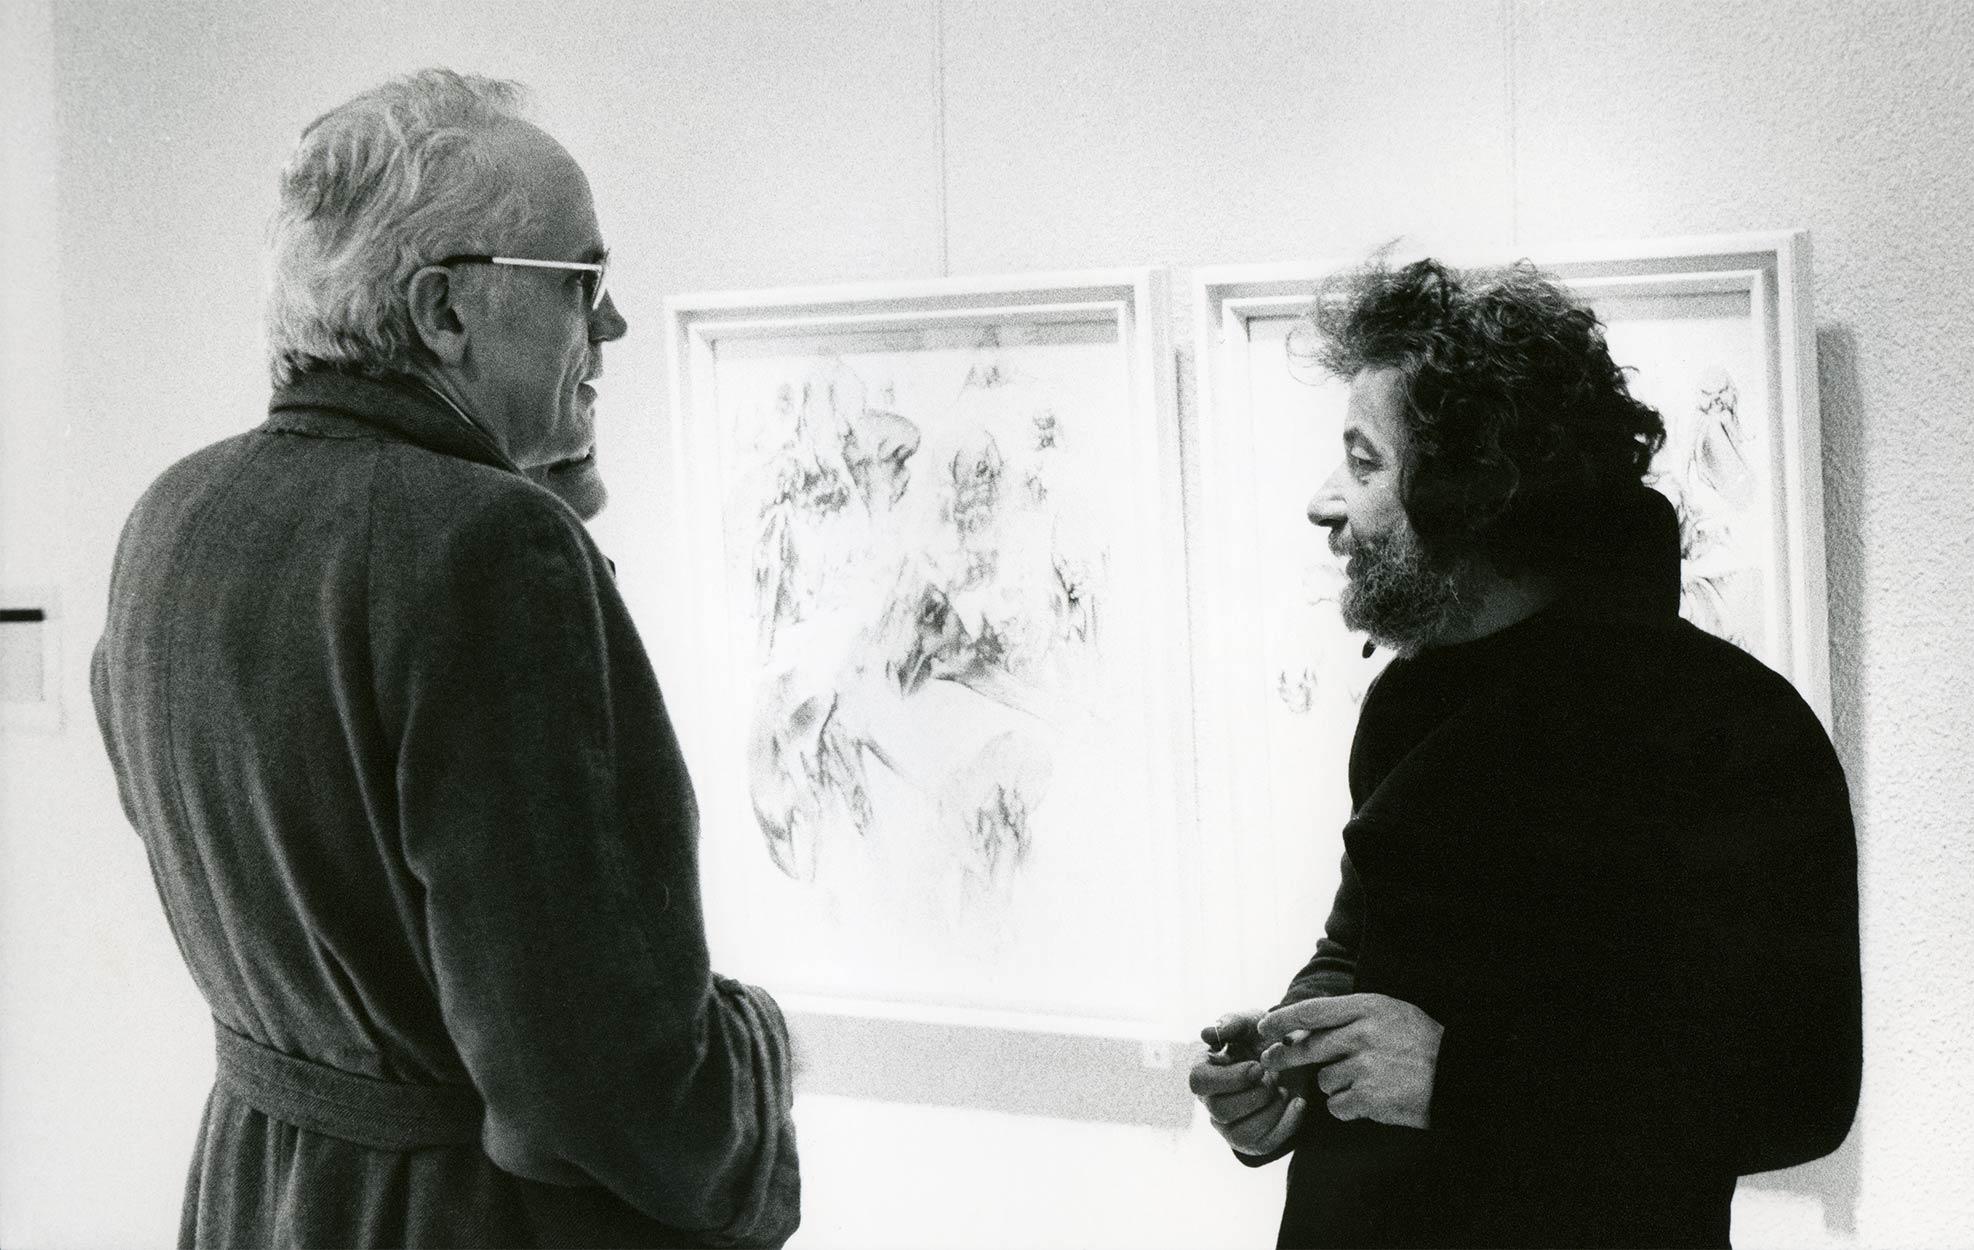 Alain Jouffroy and Dado